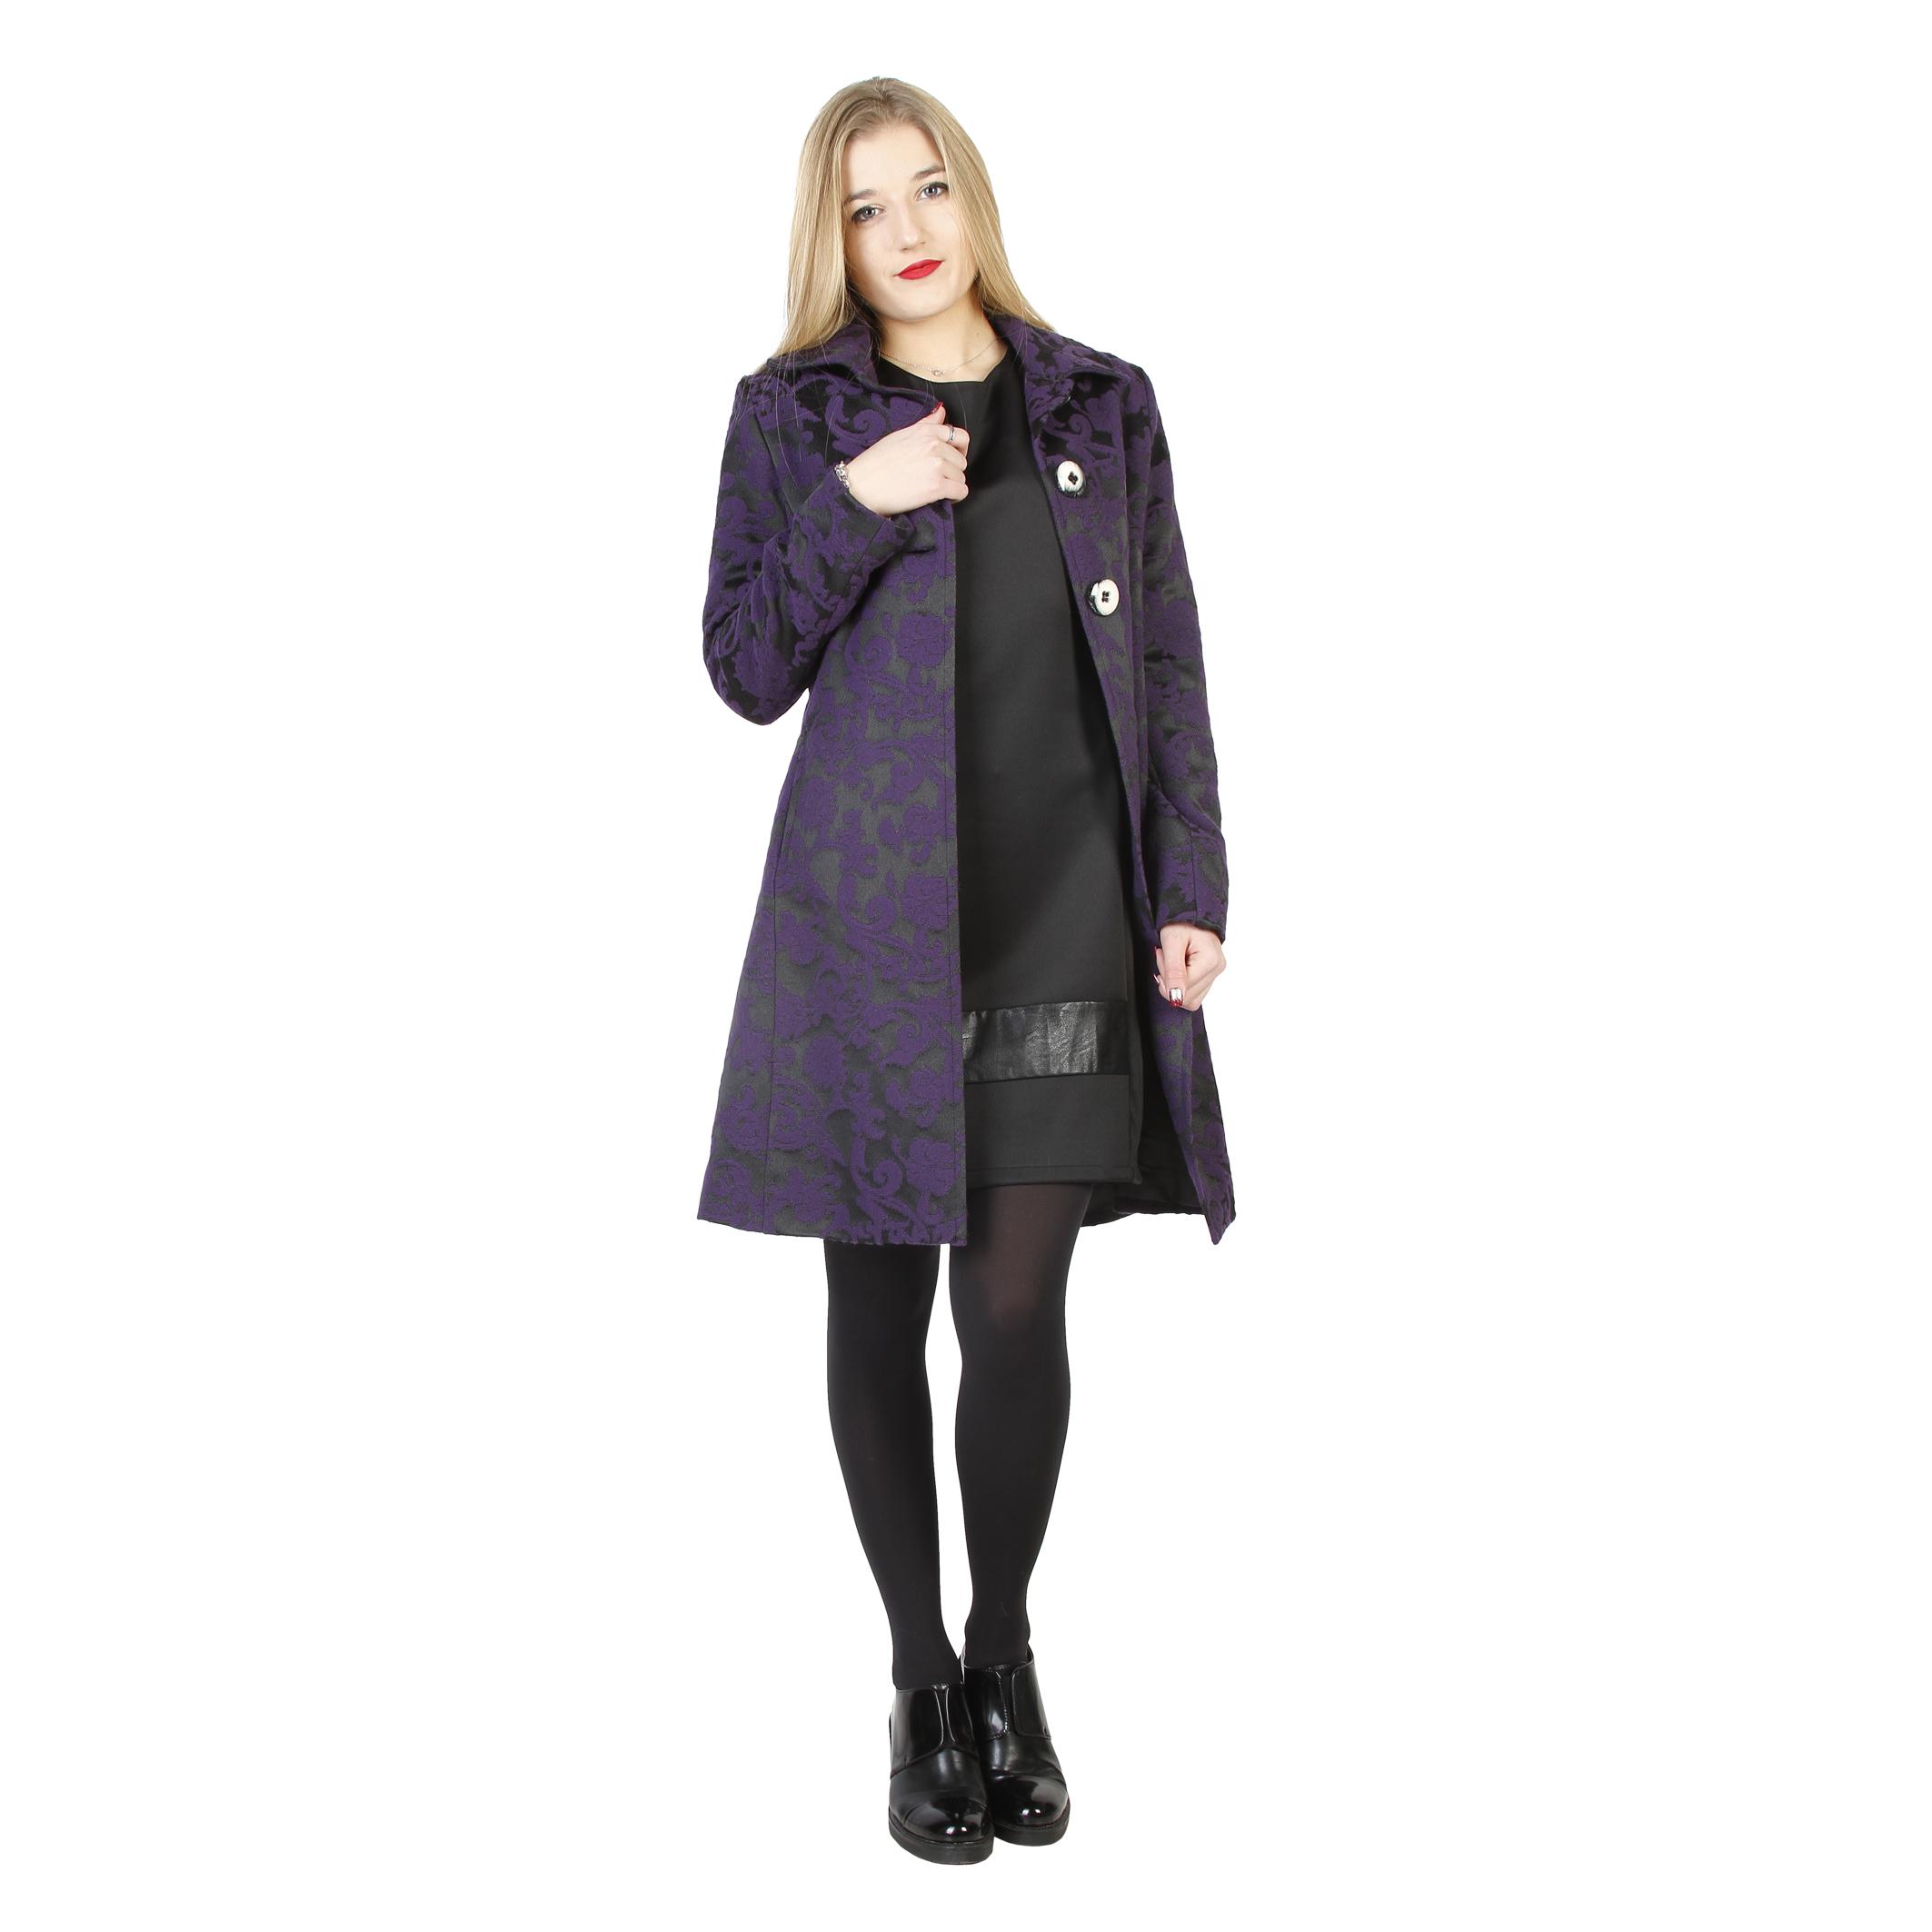 manteau droit fontana 2.0 ESMERALDA_JACQUARD_PURPLE